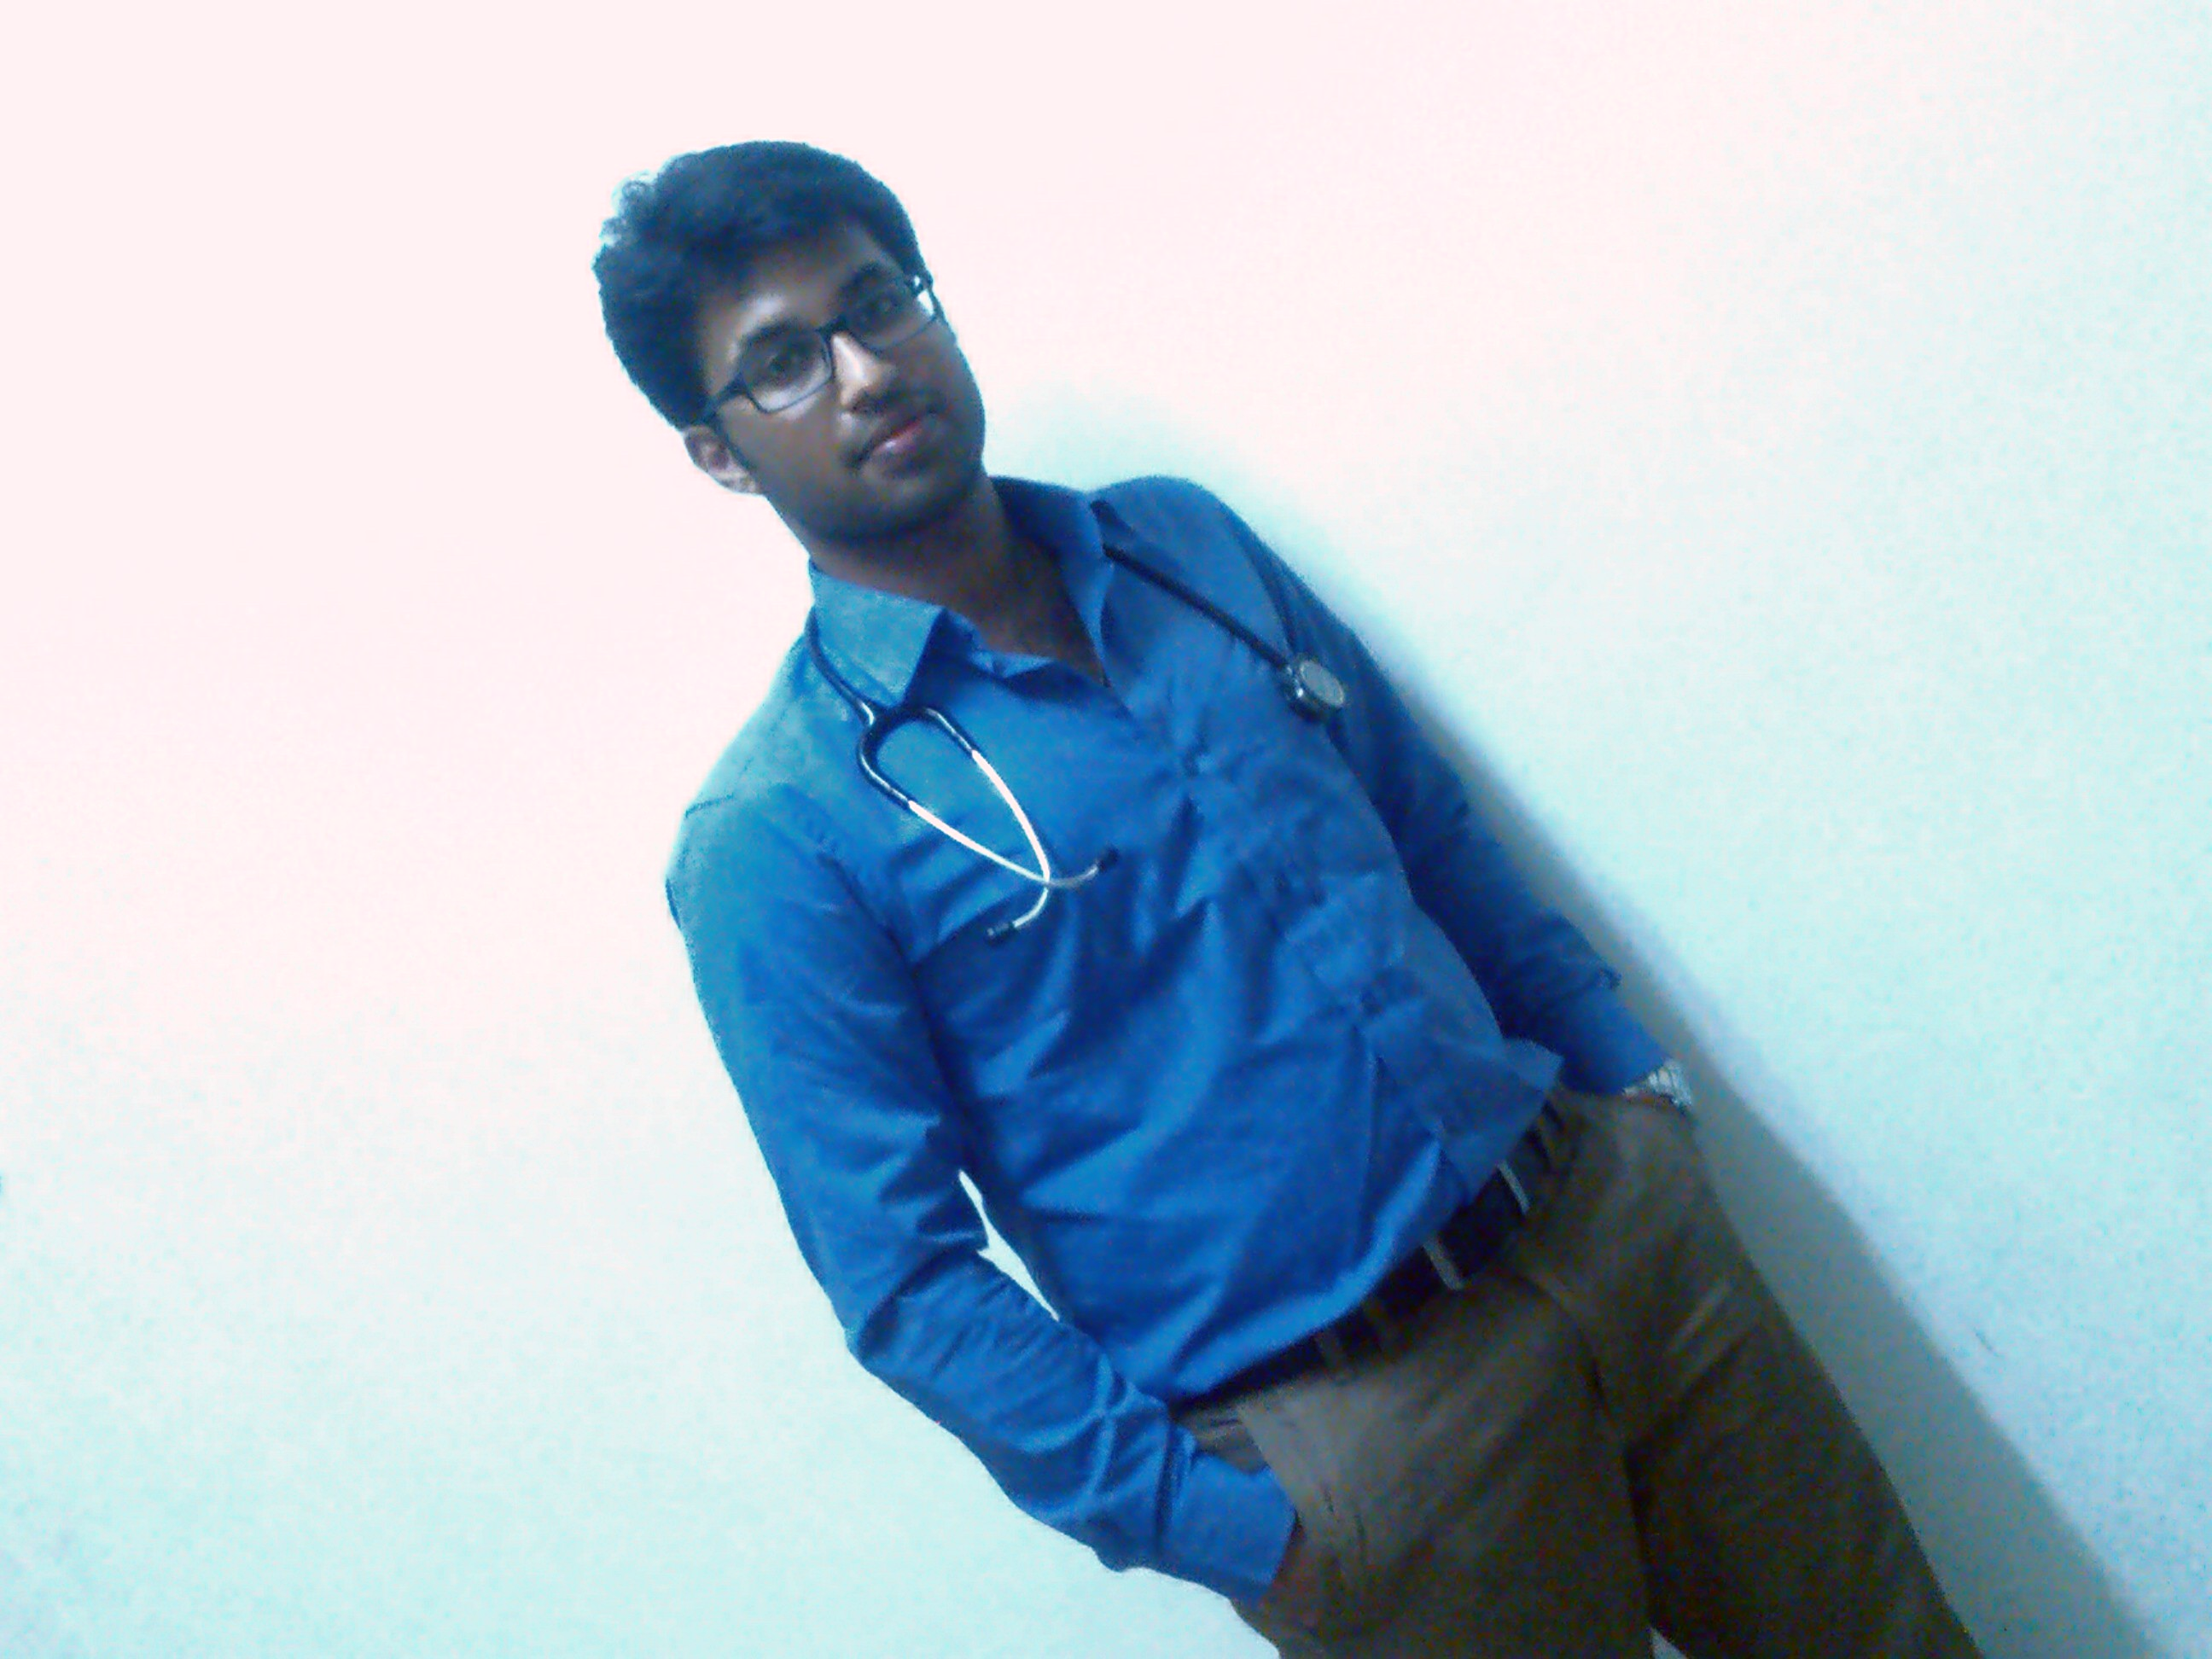 VaishnavR